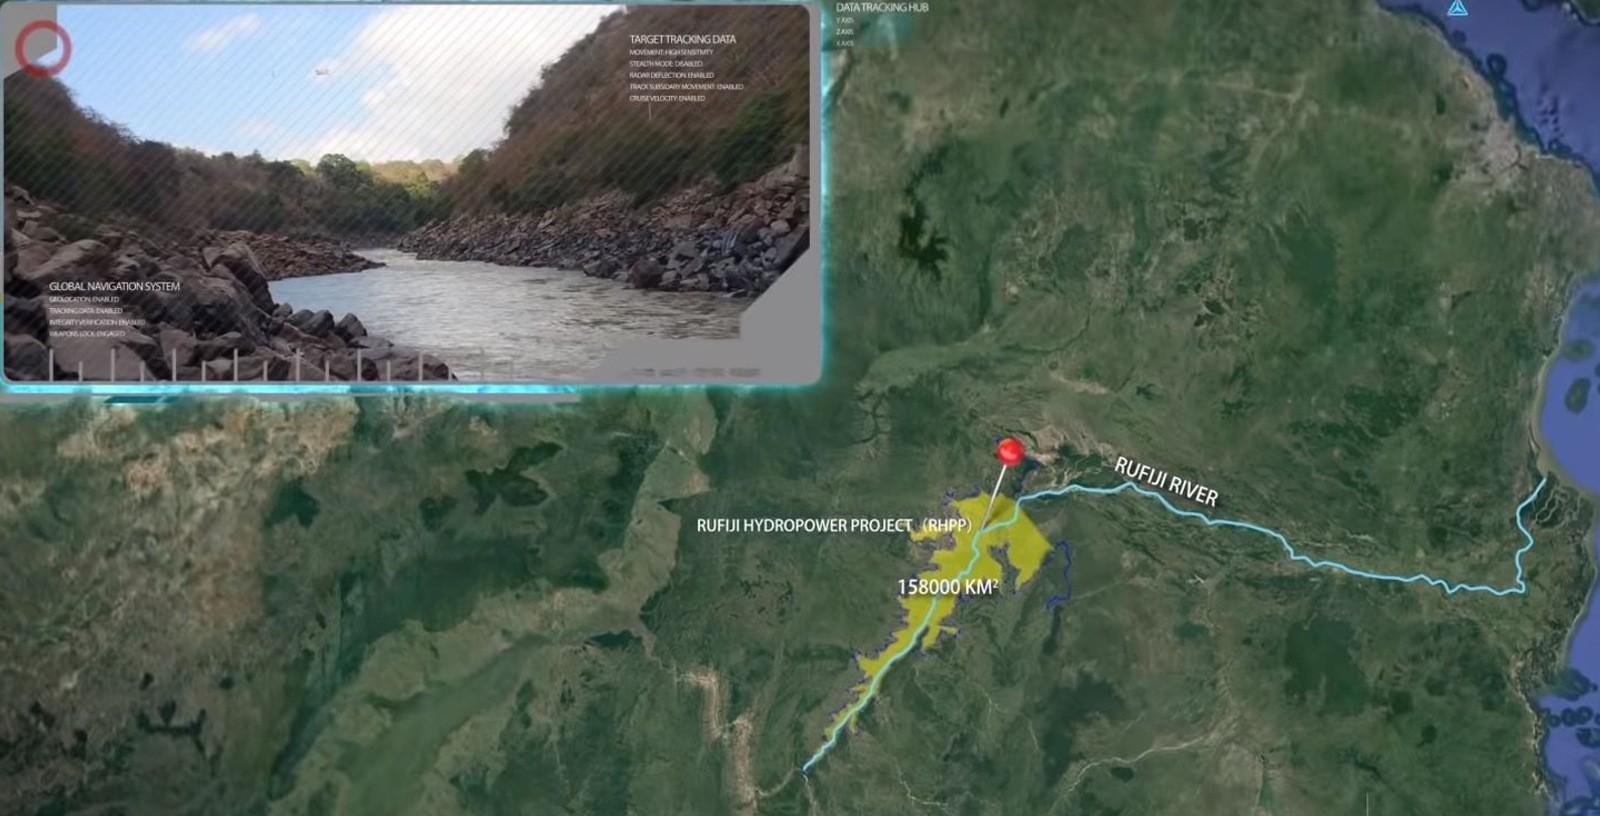 Rufiji_Hydropower_Plant_Contractors_Engineer_Tanzania_Elsewedy_IDOM_02